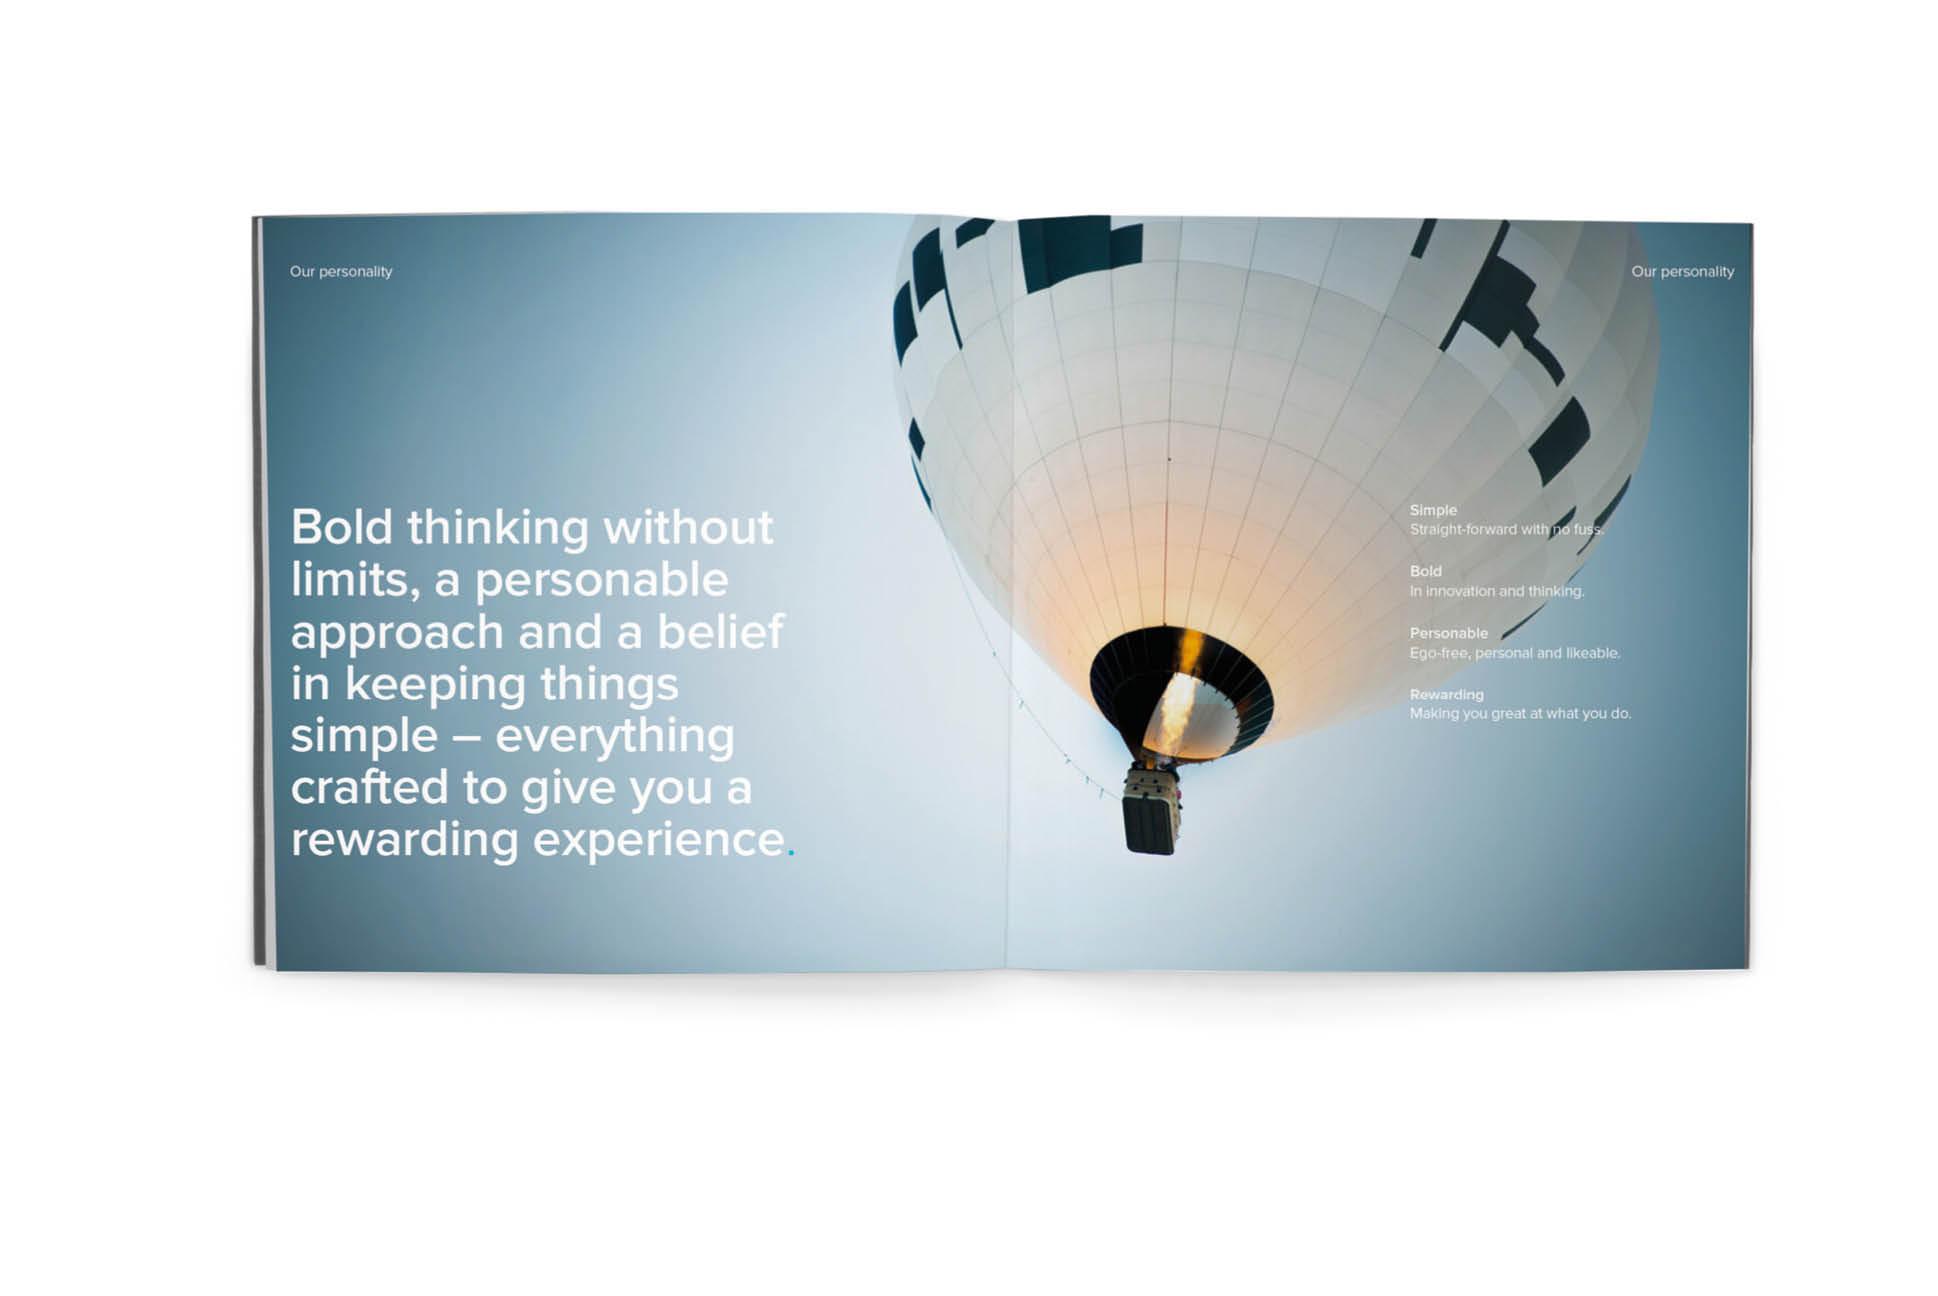 hubbul guidelines   Branding, Strategy and Logo Design   Independent Marketing   IM London   London Branding Agency